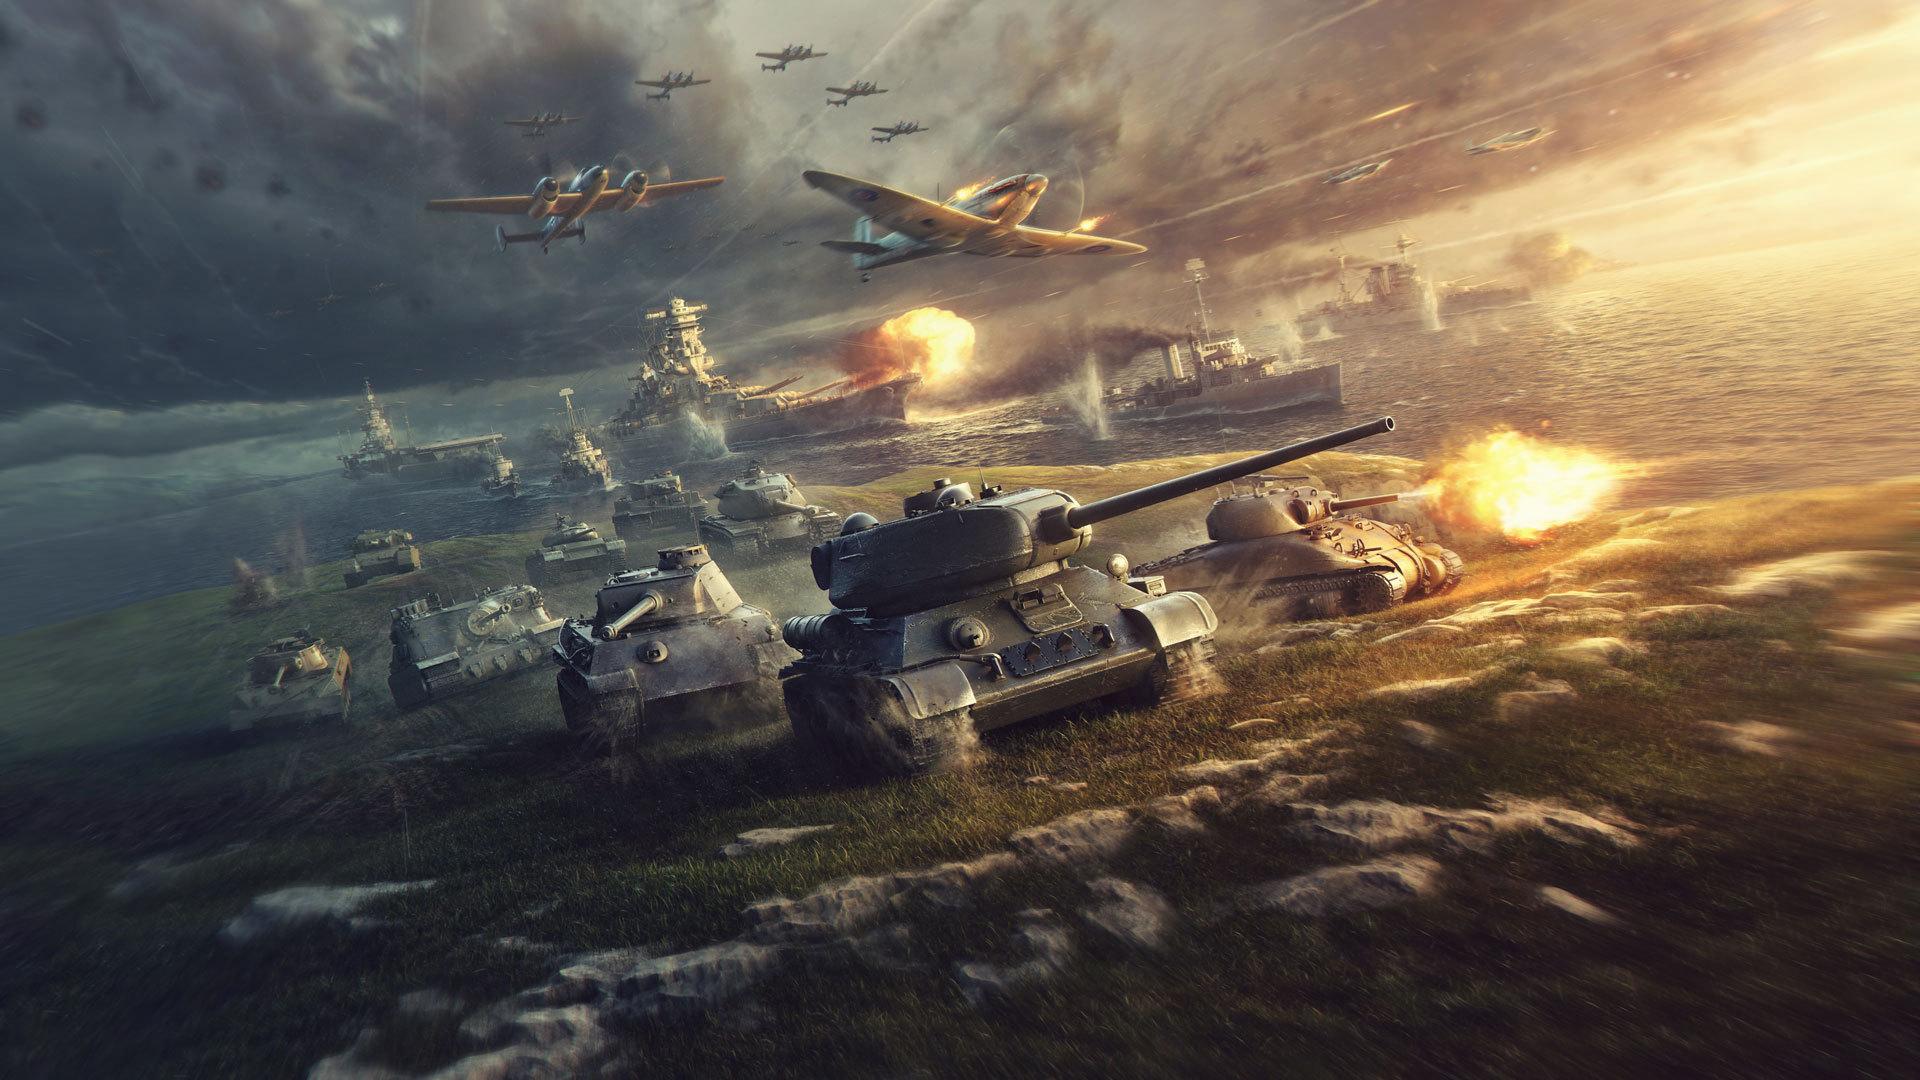 World Of Tanks Wallpapers HD Backgrounds | WallpapersIn4k net